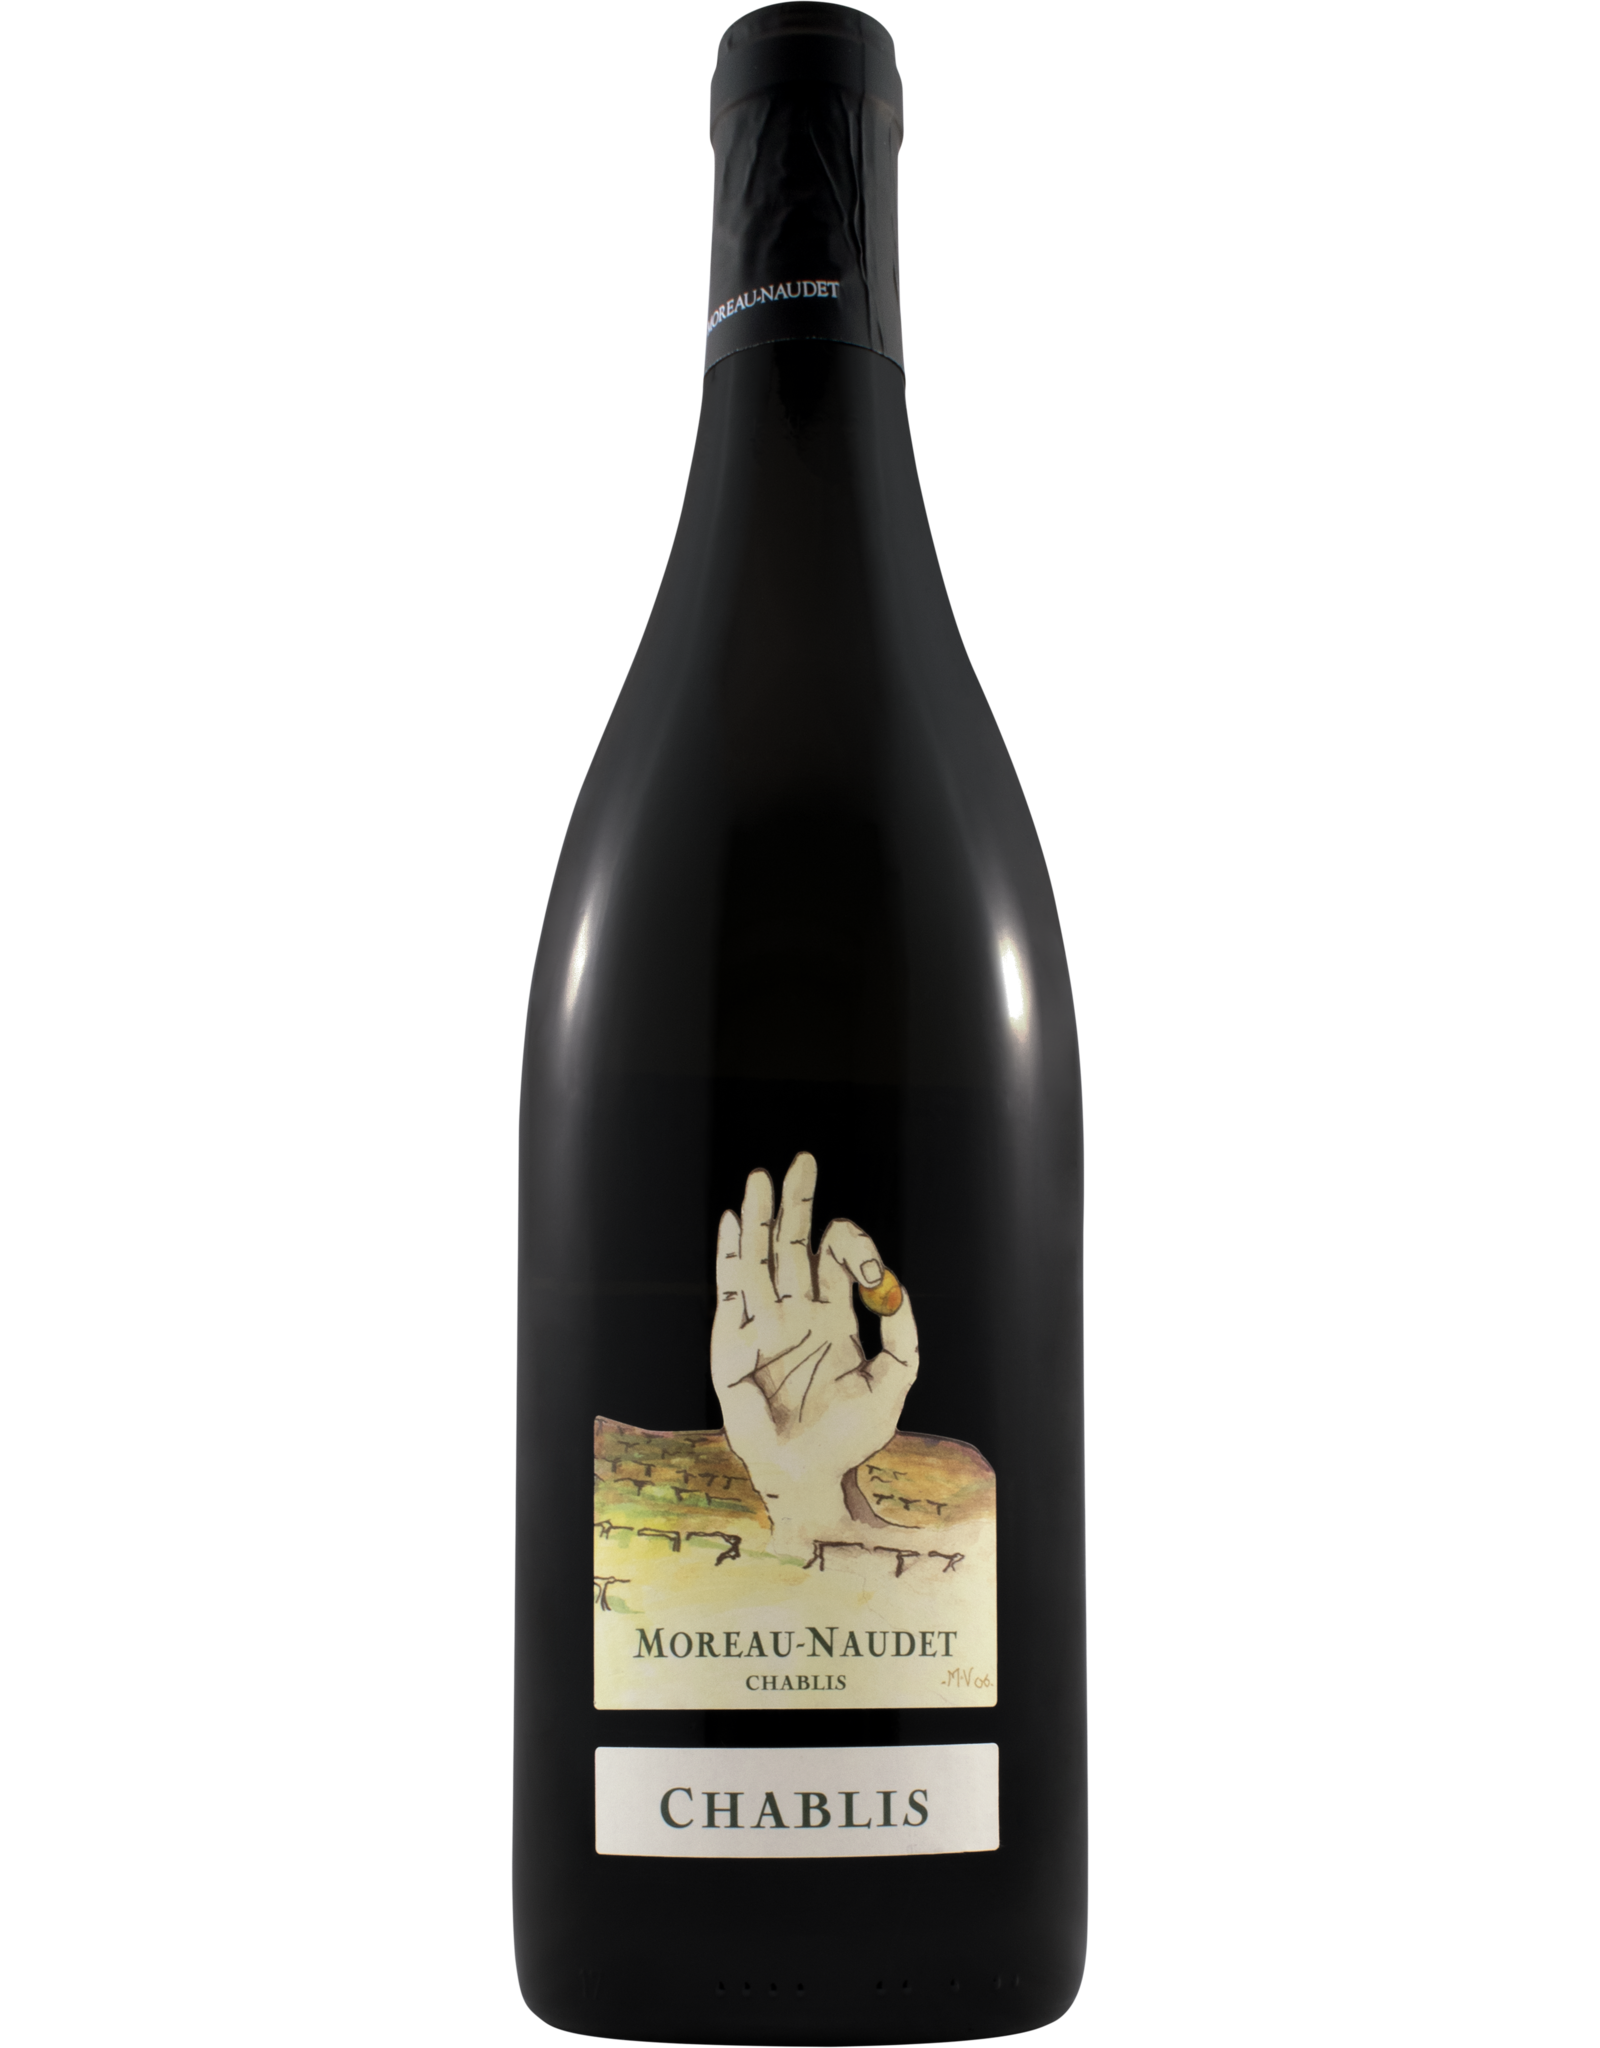 Moreau-Naudet Chablis